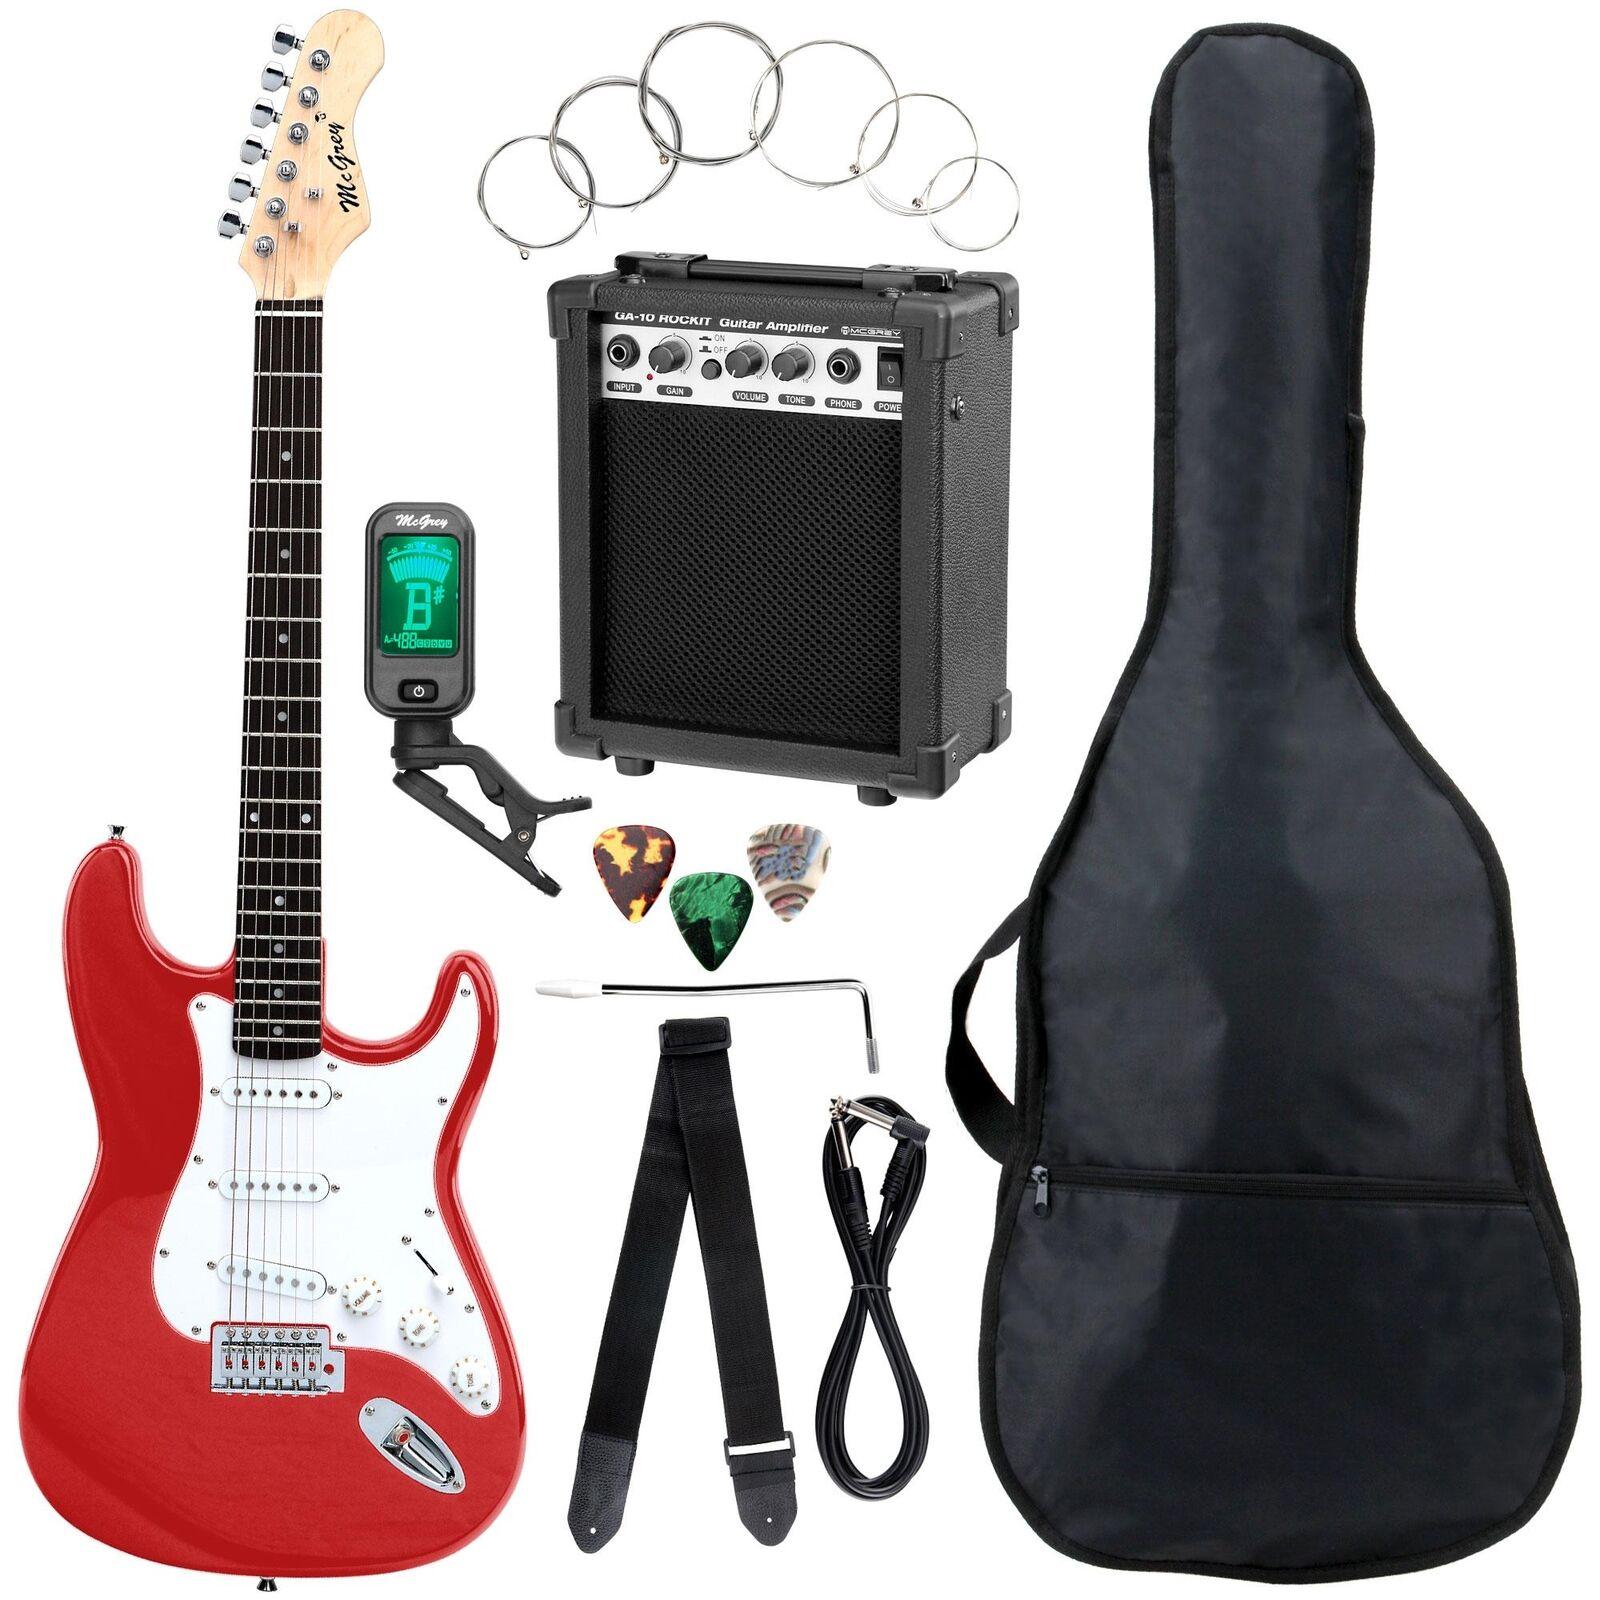 E-Gitarre Komplett Set Verstärker Stimmgerät Tuner Gigbag Tasche rot Fiesta ROT